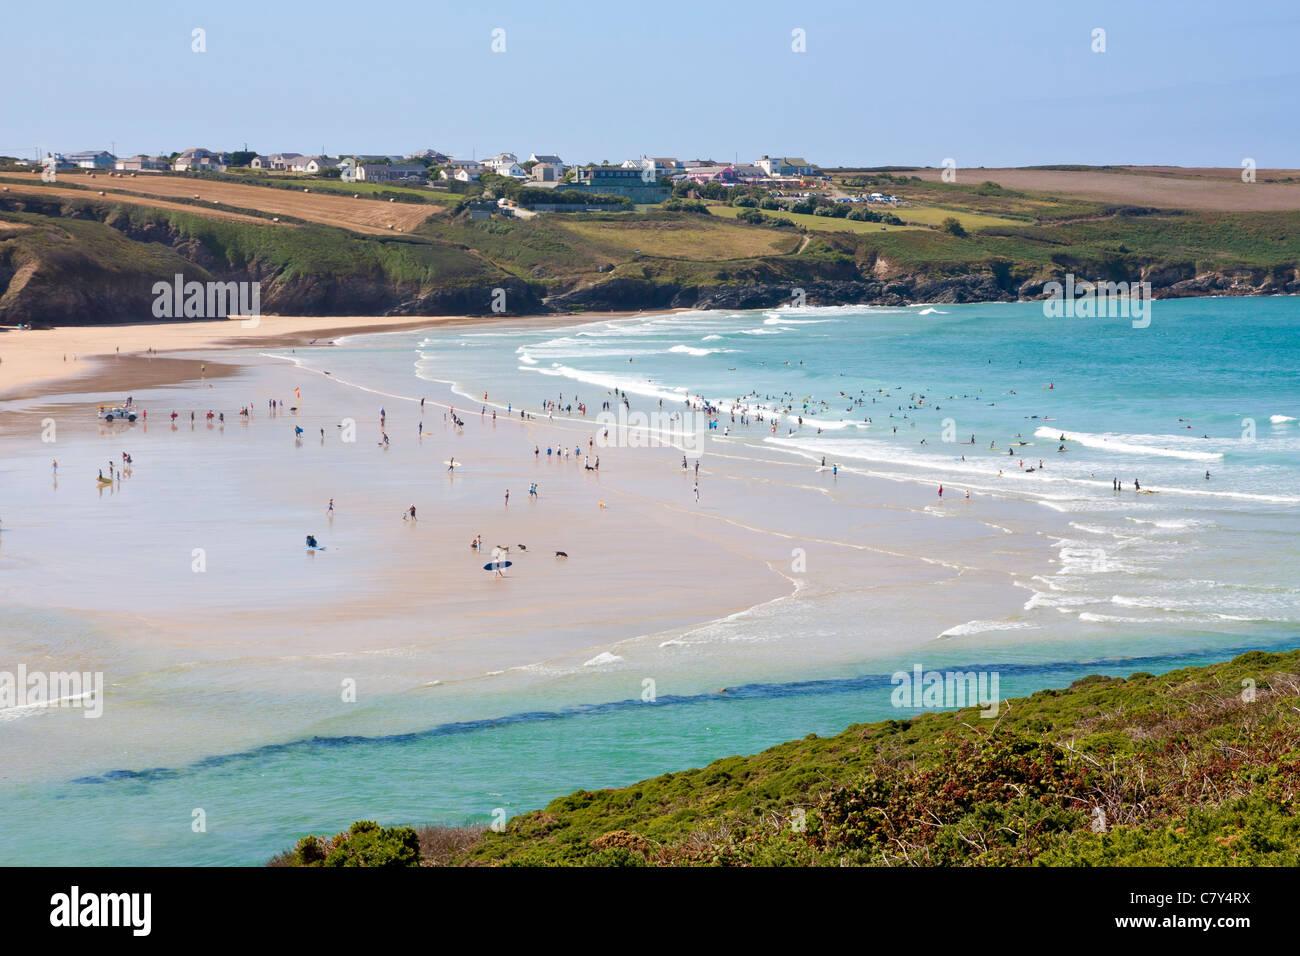 Overlooking Crantock Beach near Newquay Cornwall England UK - Stock Image